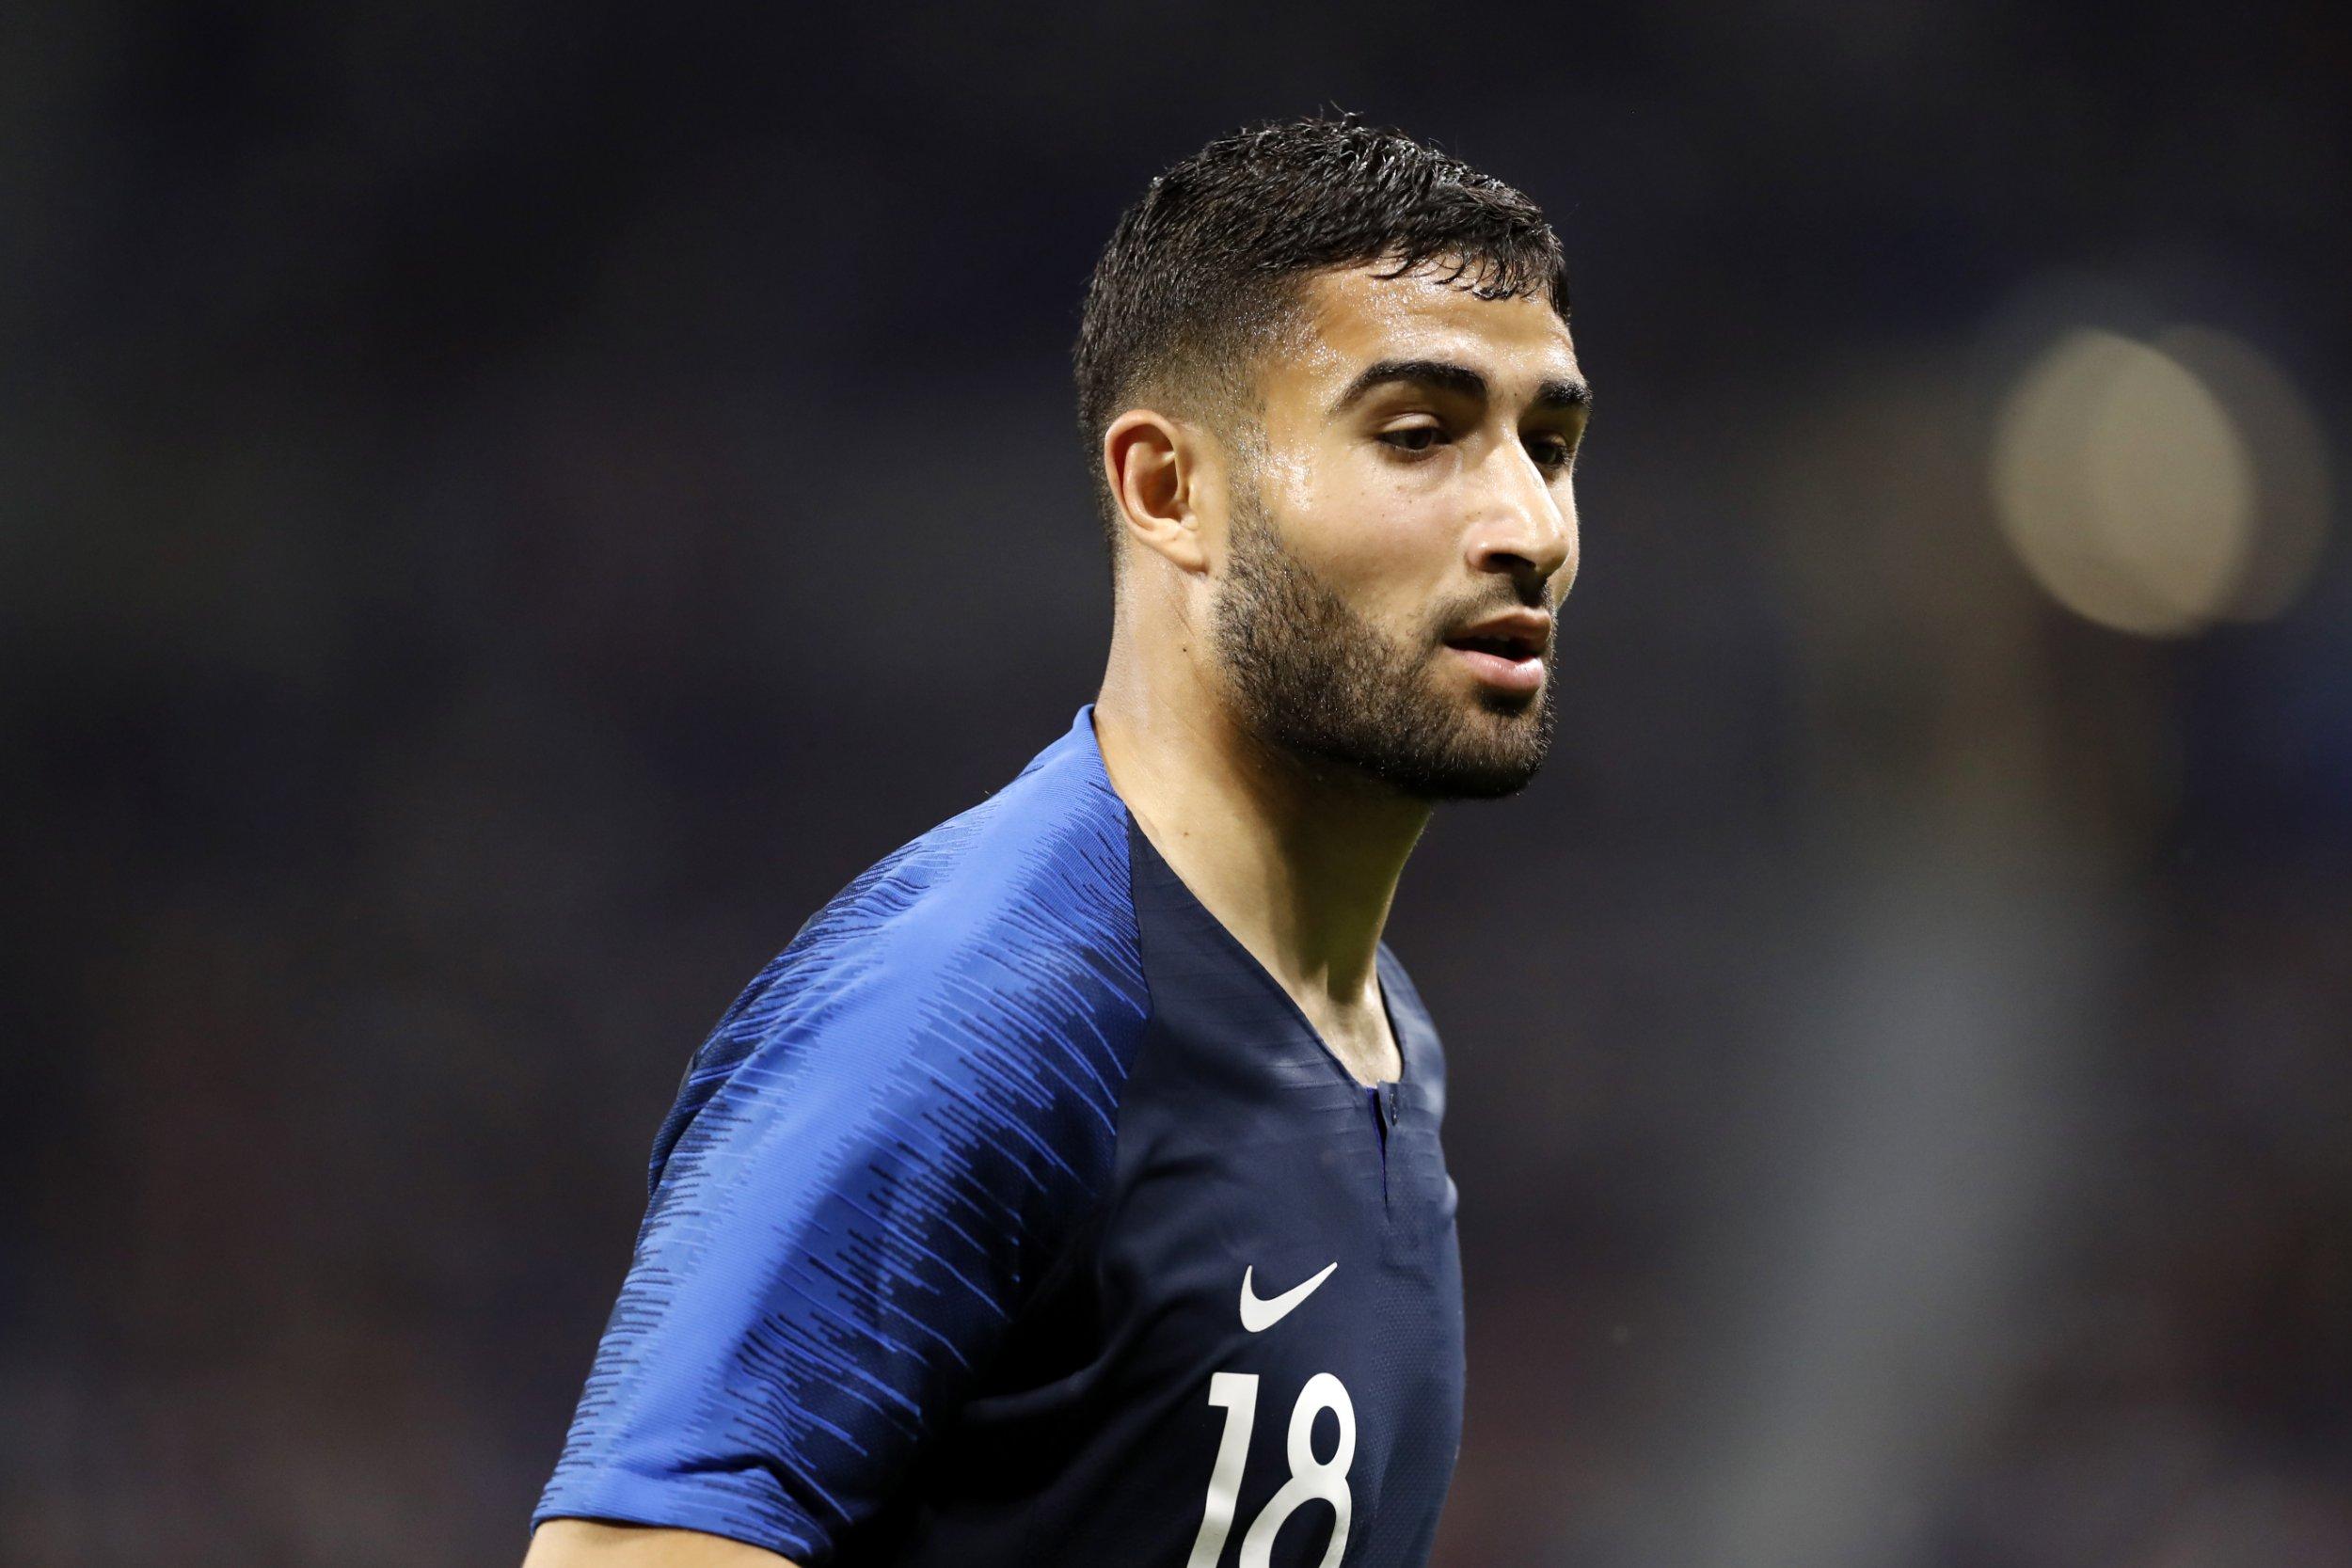 epa06797787 Nabil Fekir of France during the International Friendly soccer match between France and USA in Lyon, France, 09 June 2018. EPA/ALEX MARTIN